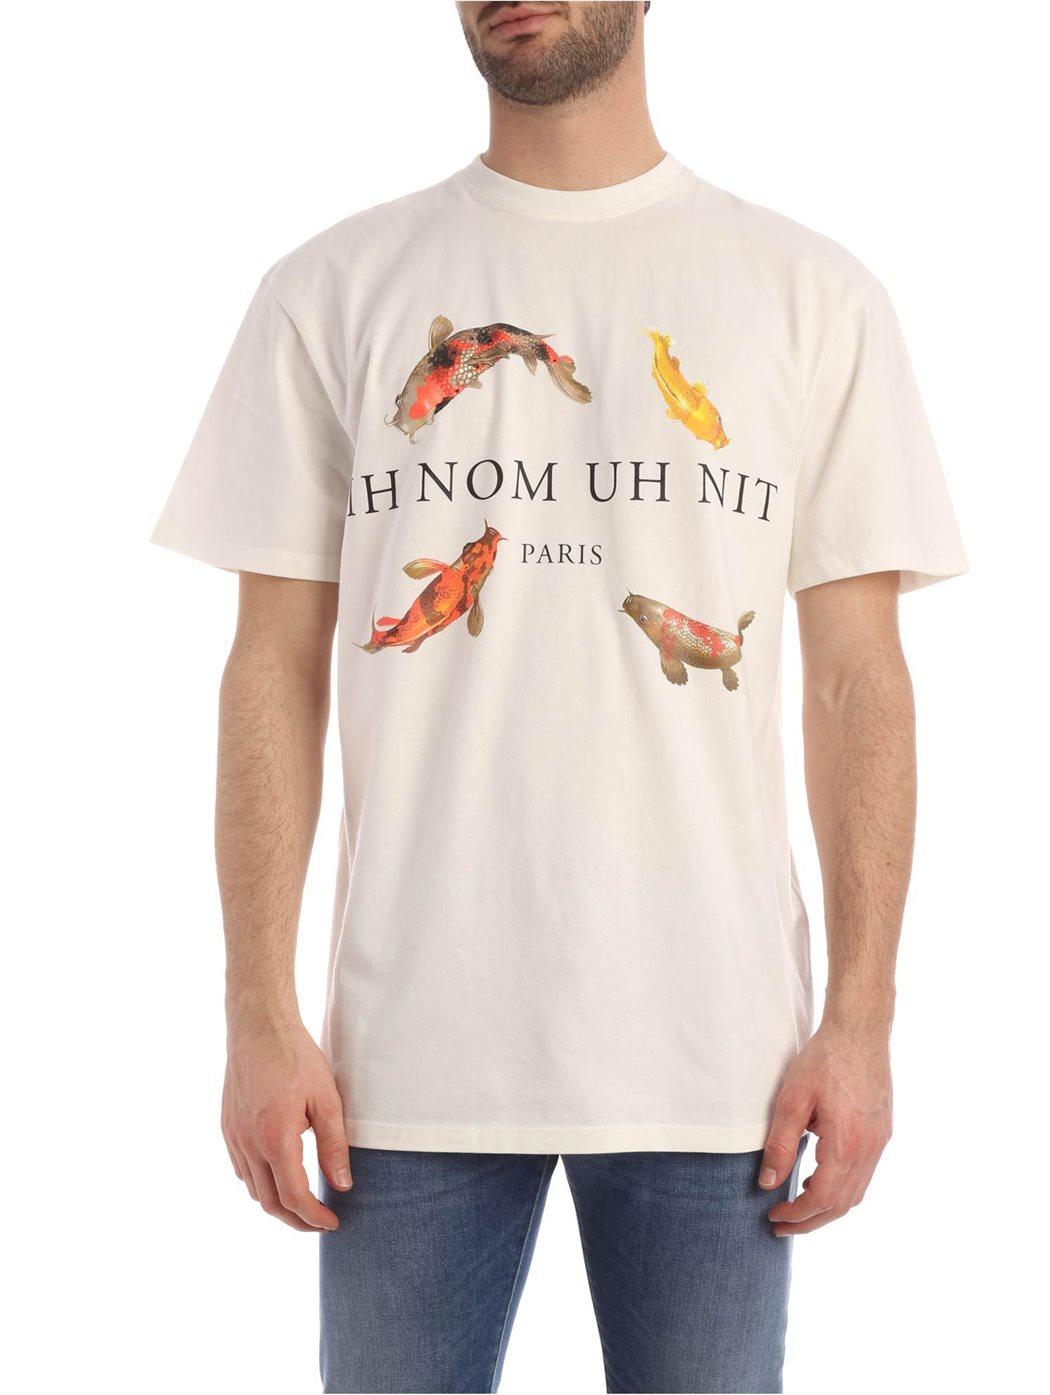 IH NOM UH NIT NMS 081 T-SHIRT